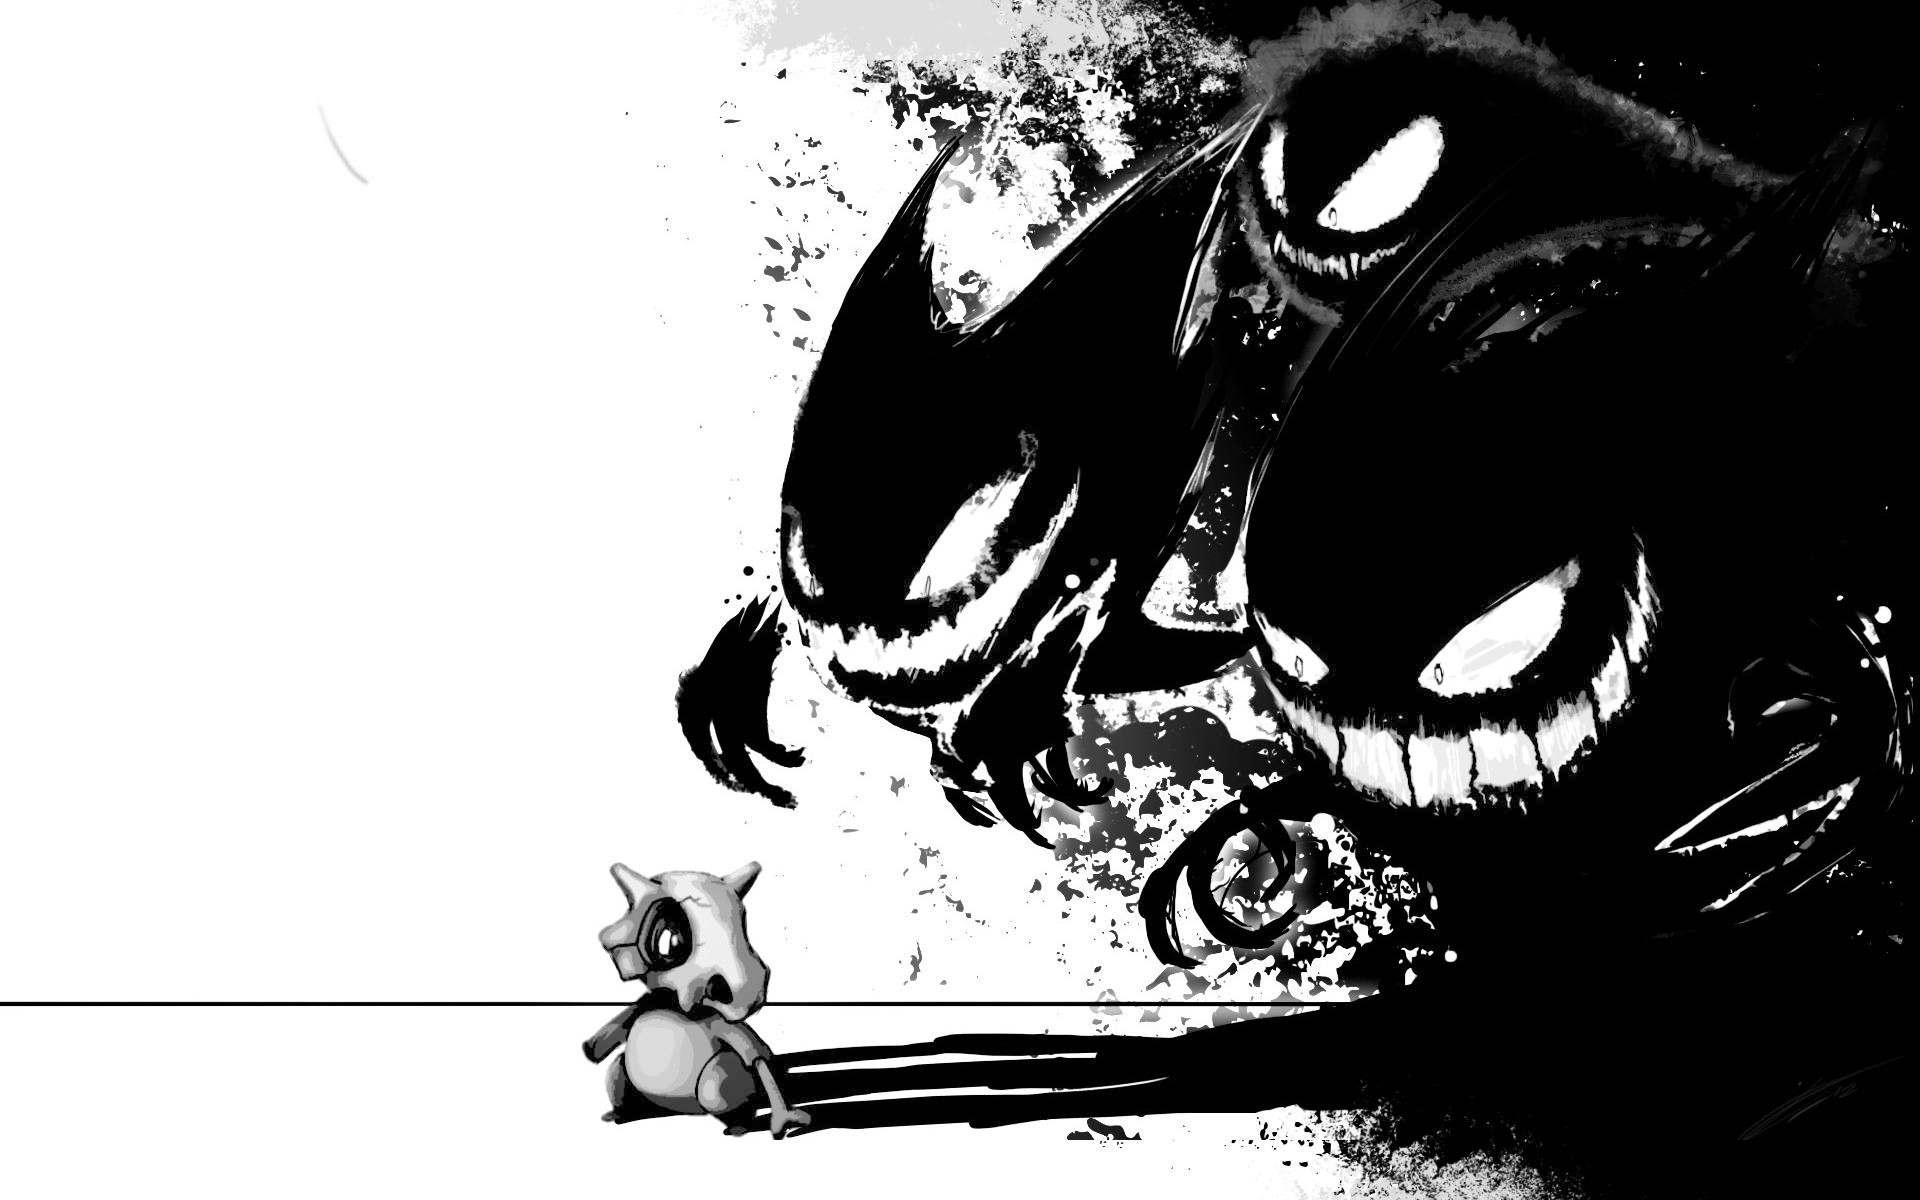 Ghost Pokemon Wallpaper Group   HD Wallpapers   Pinterest   Ghost pokemon  and Wallpaper